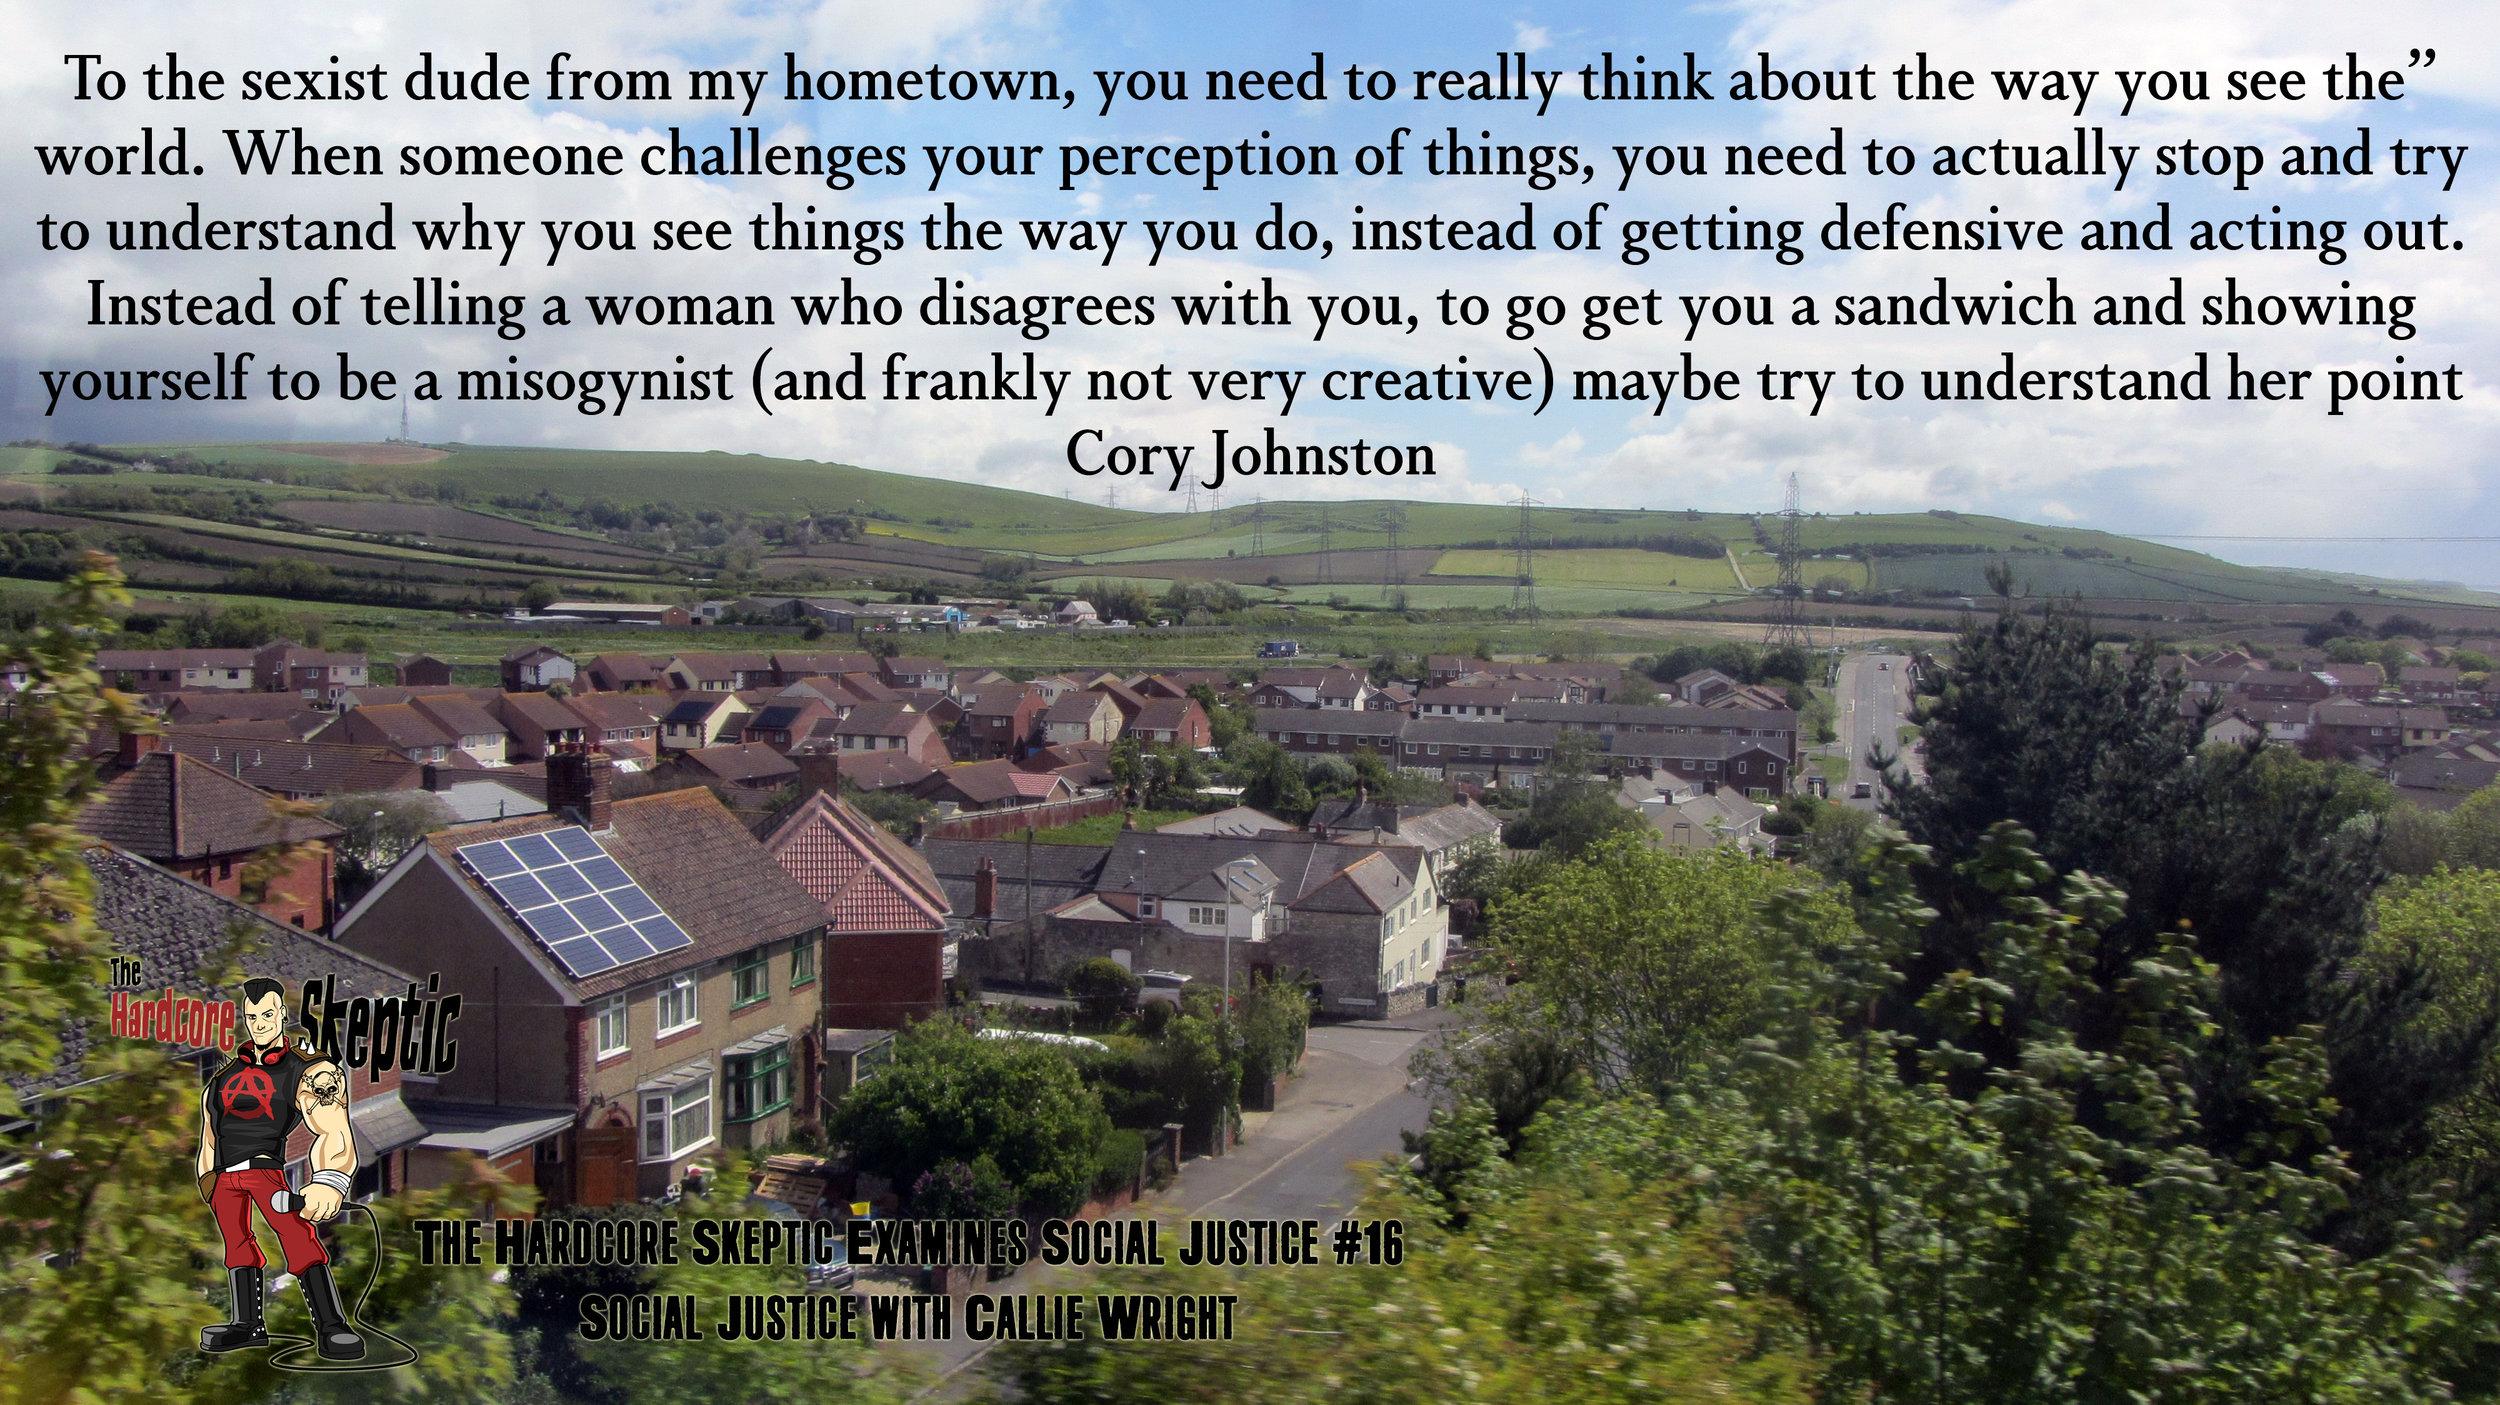 sexist hometown dude - Cory.jpg